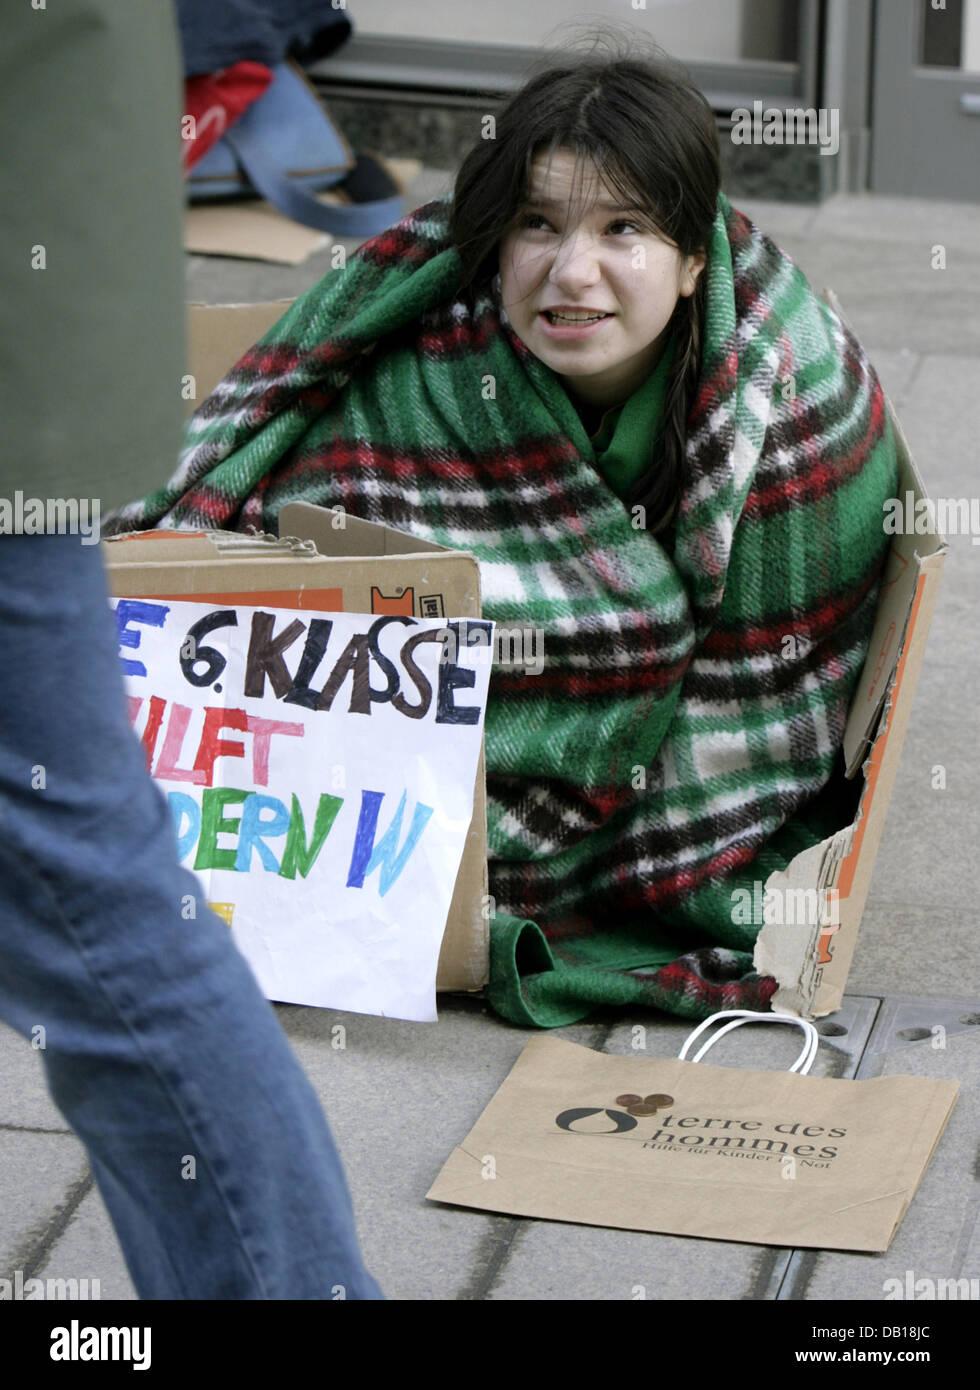 11 year-old, sixth grade pupil Teresa from 'Evangelisches Schulzentrum' (Lit.: 'Protestant School Centre') - Stock Image